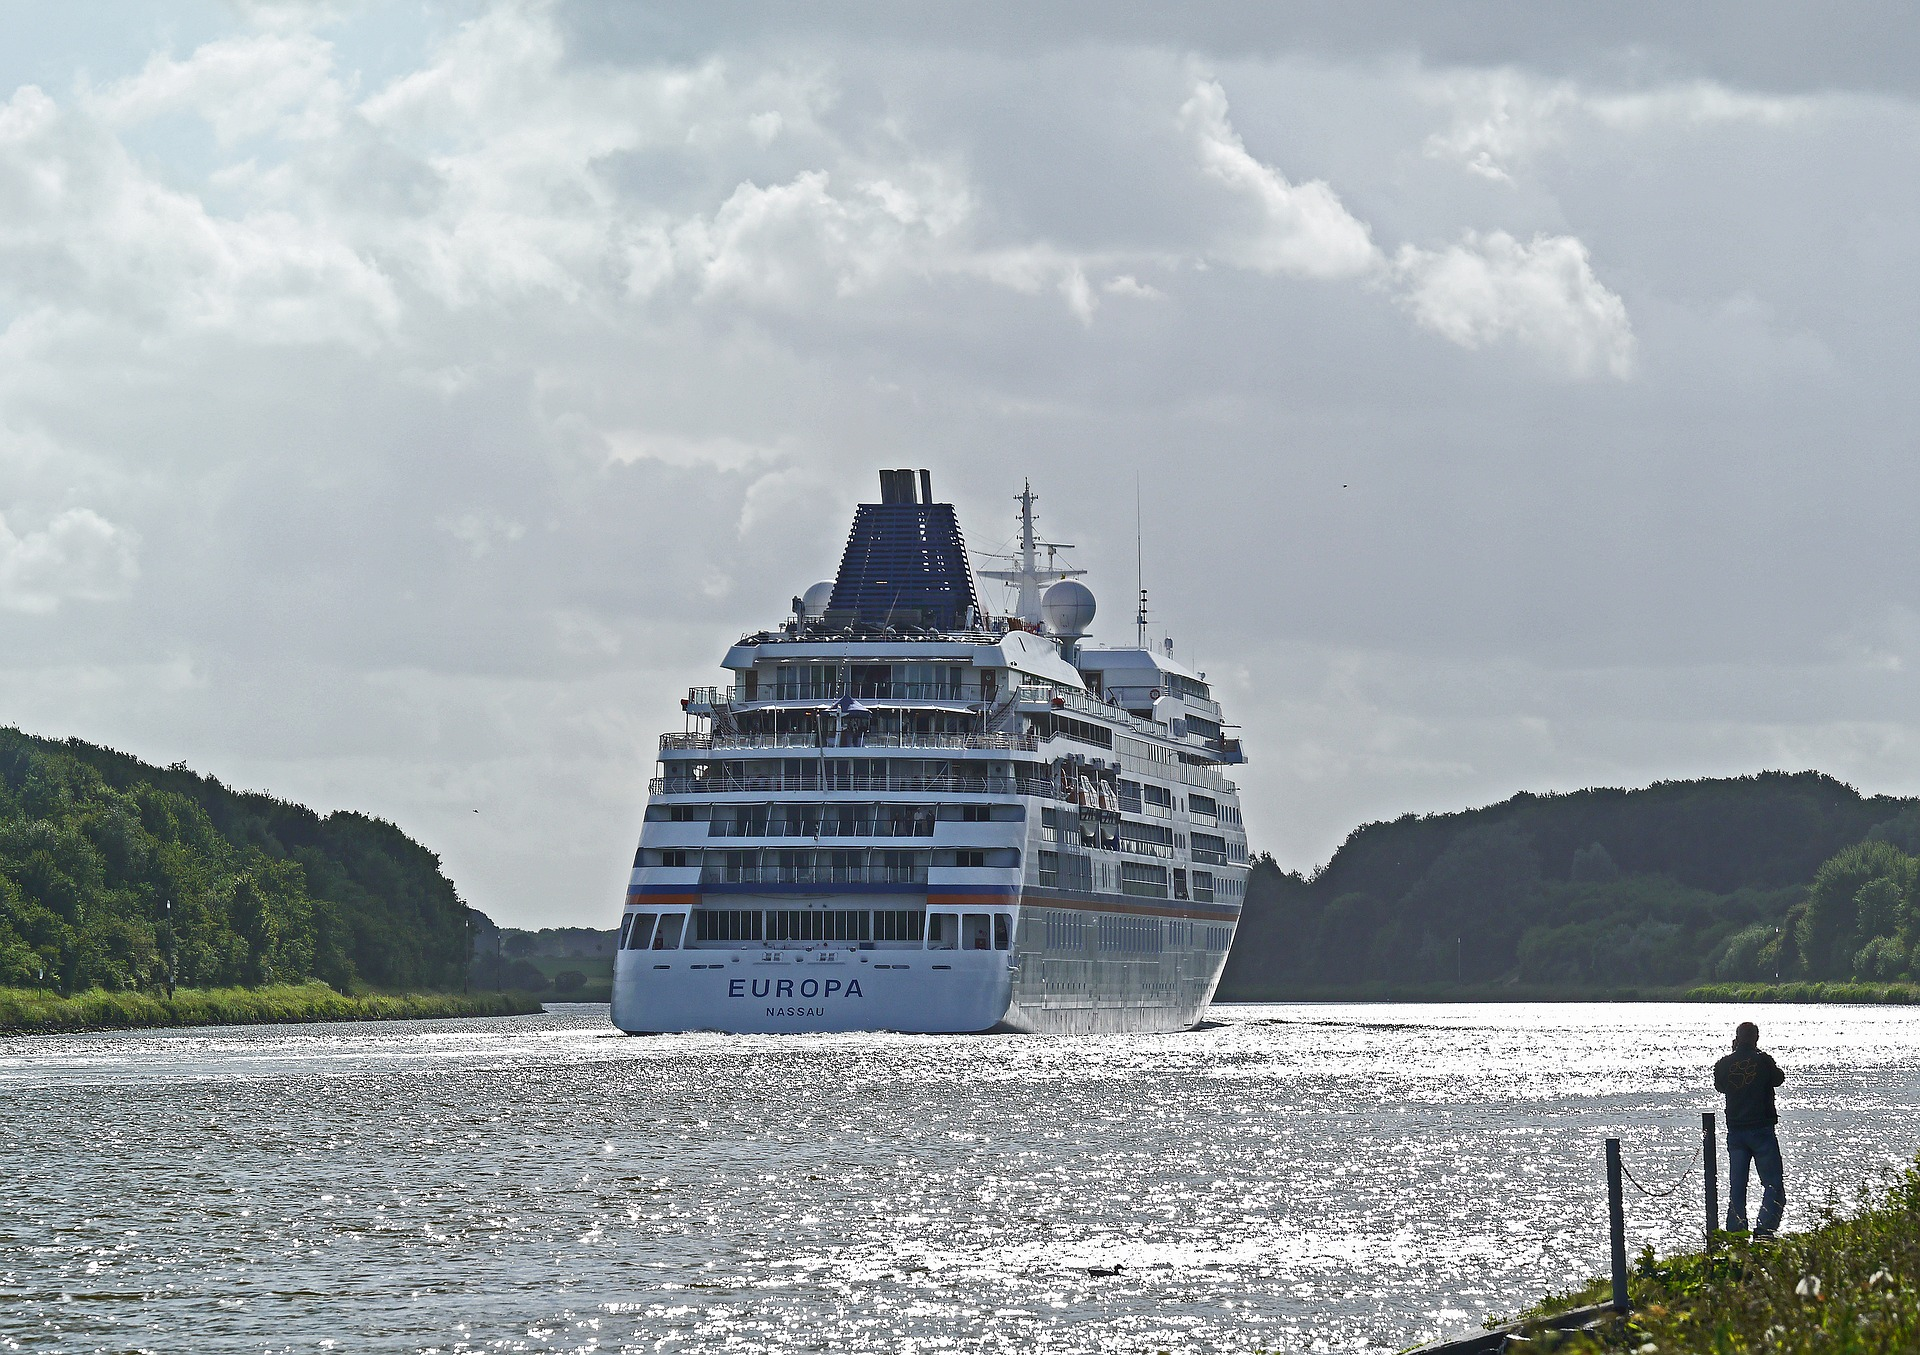 Kiel Canal Transit cruise experience